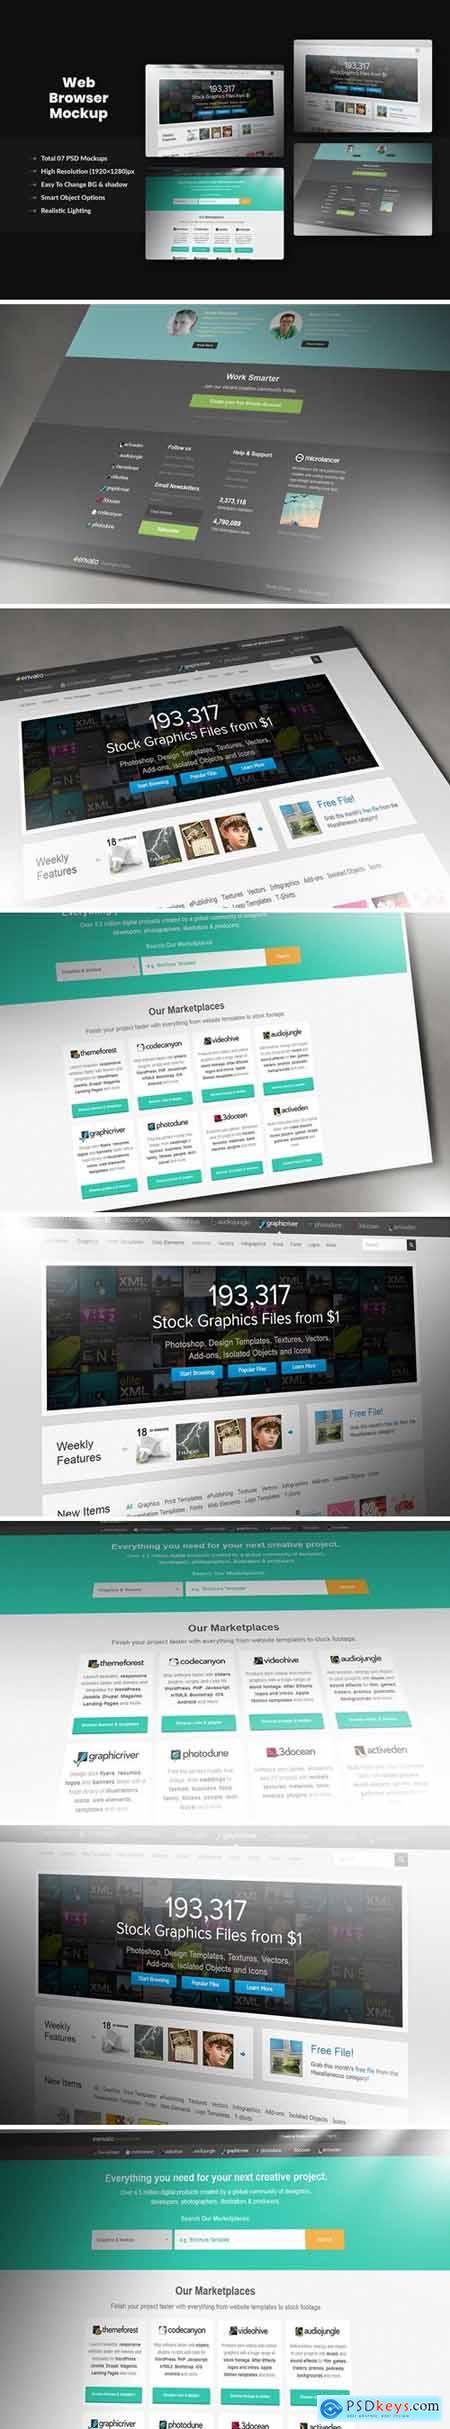 Photorealistic Pixel Screen Web-Browser Mockup